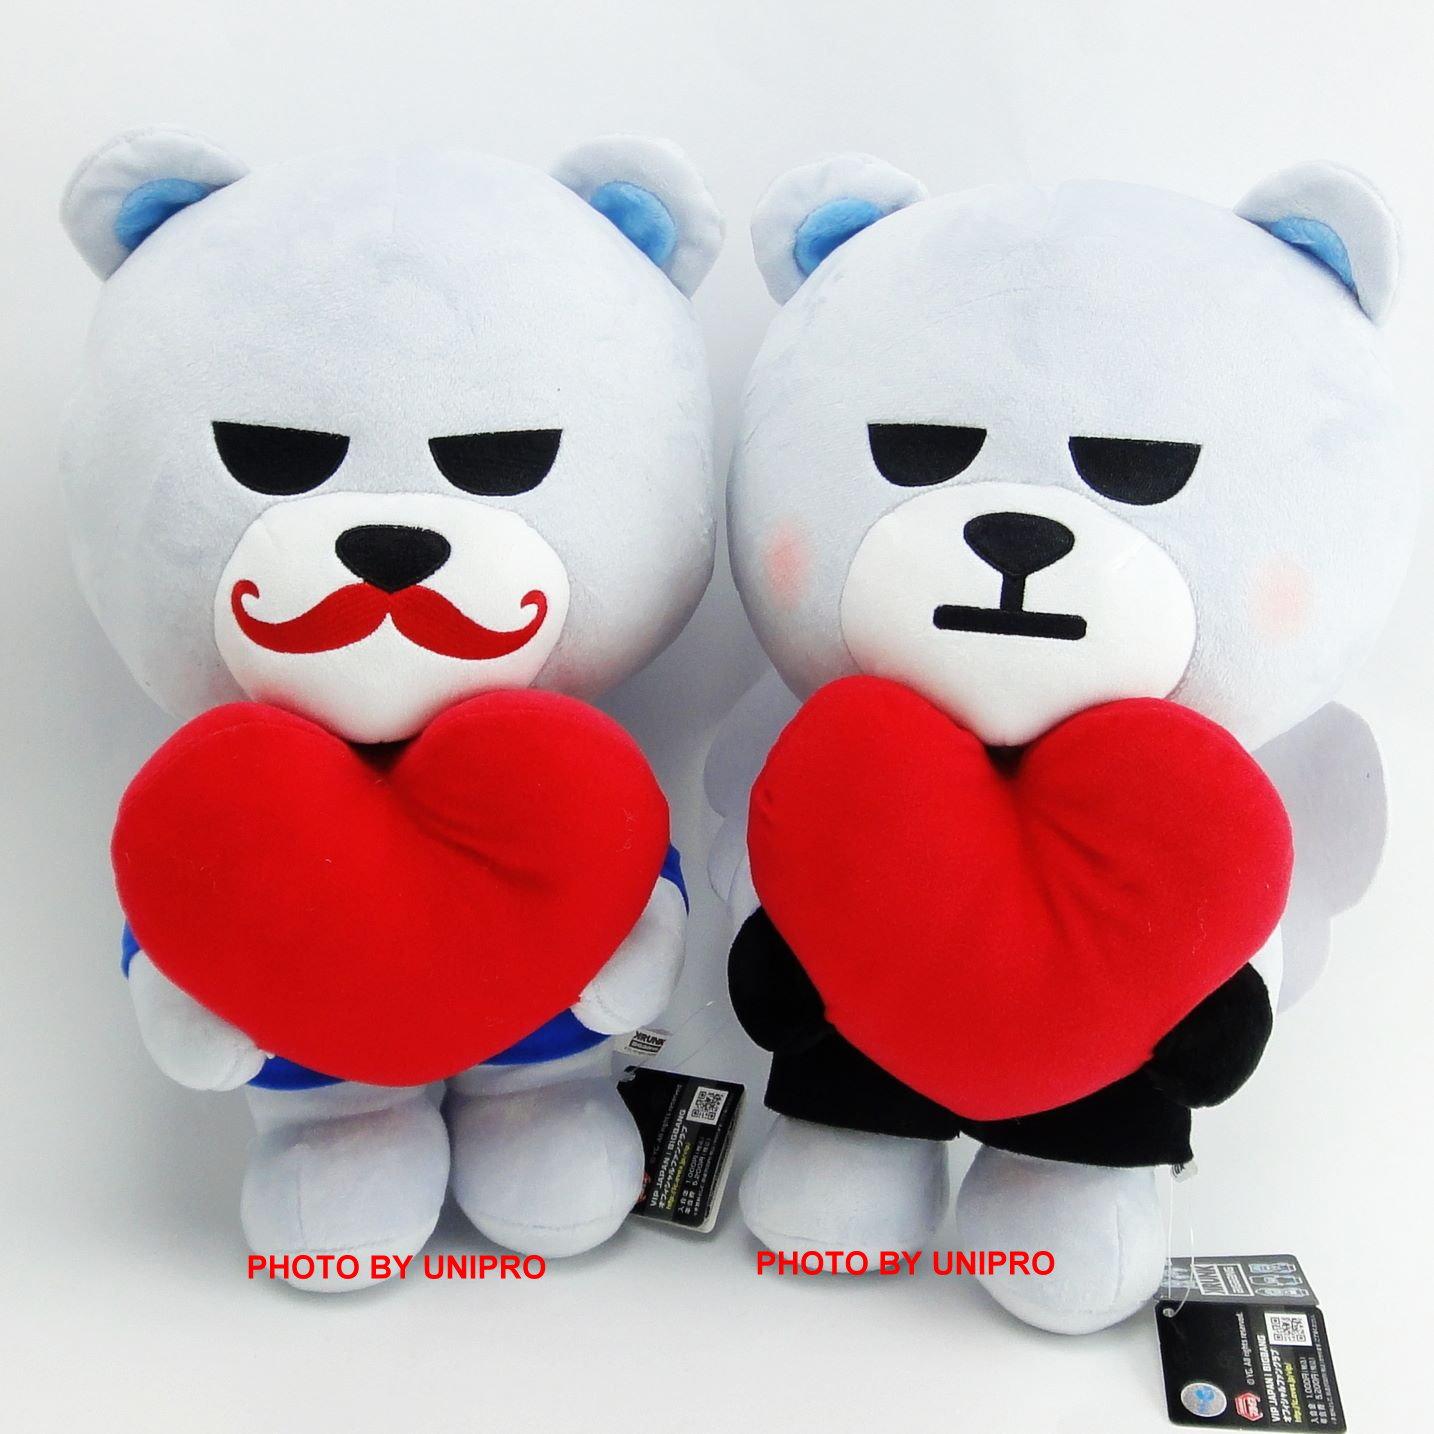 【UNIPRO】KRUNK BIGBANG BIG T.O.P TOP D-LITE 一套兩款 全兩種 絨毛 娃娃 禮物 情人節